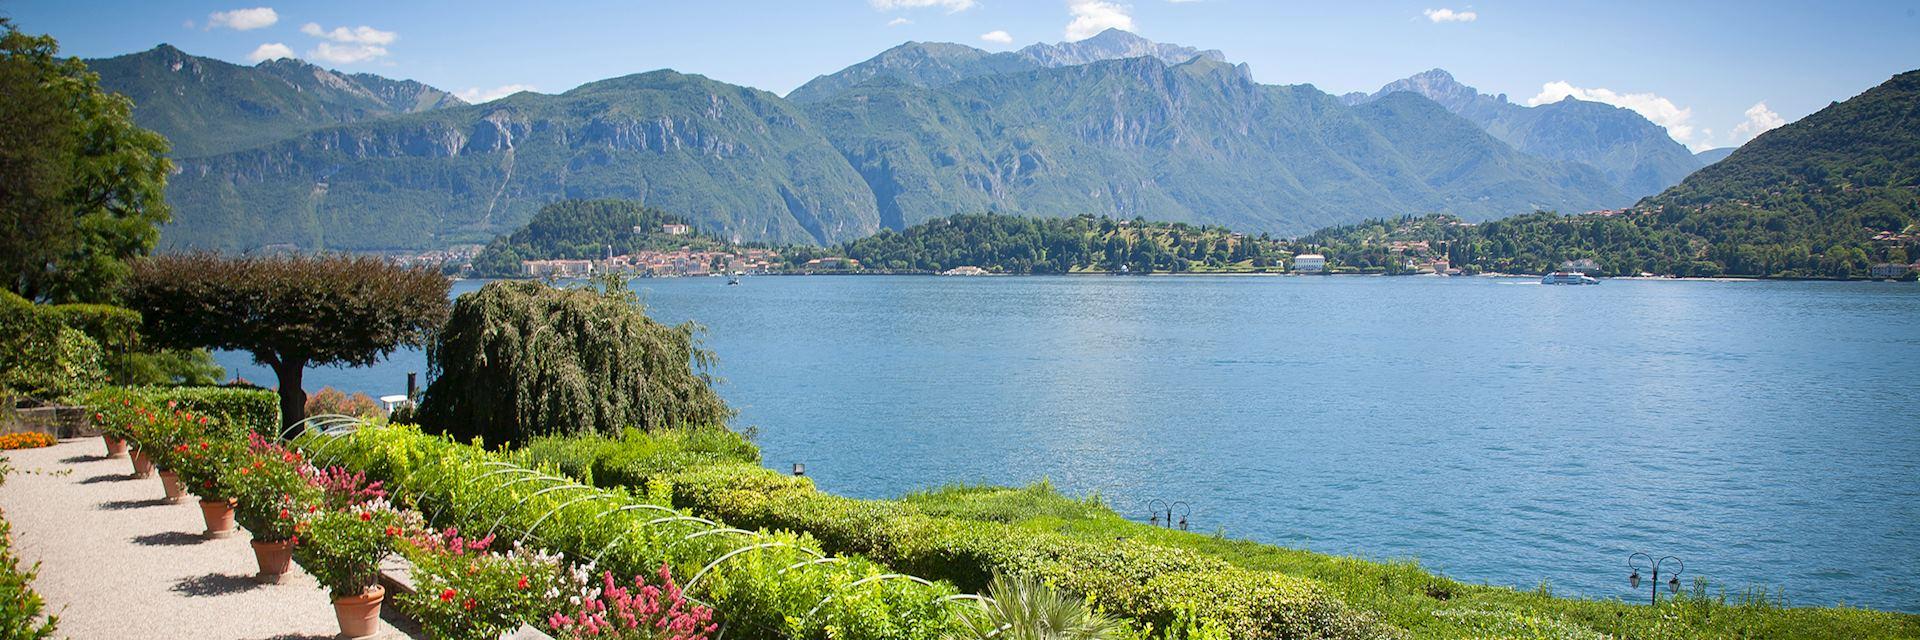 Villa Carlotta, Lake Como